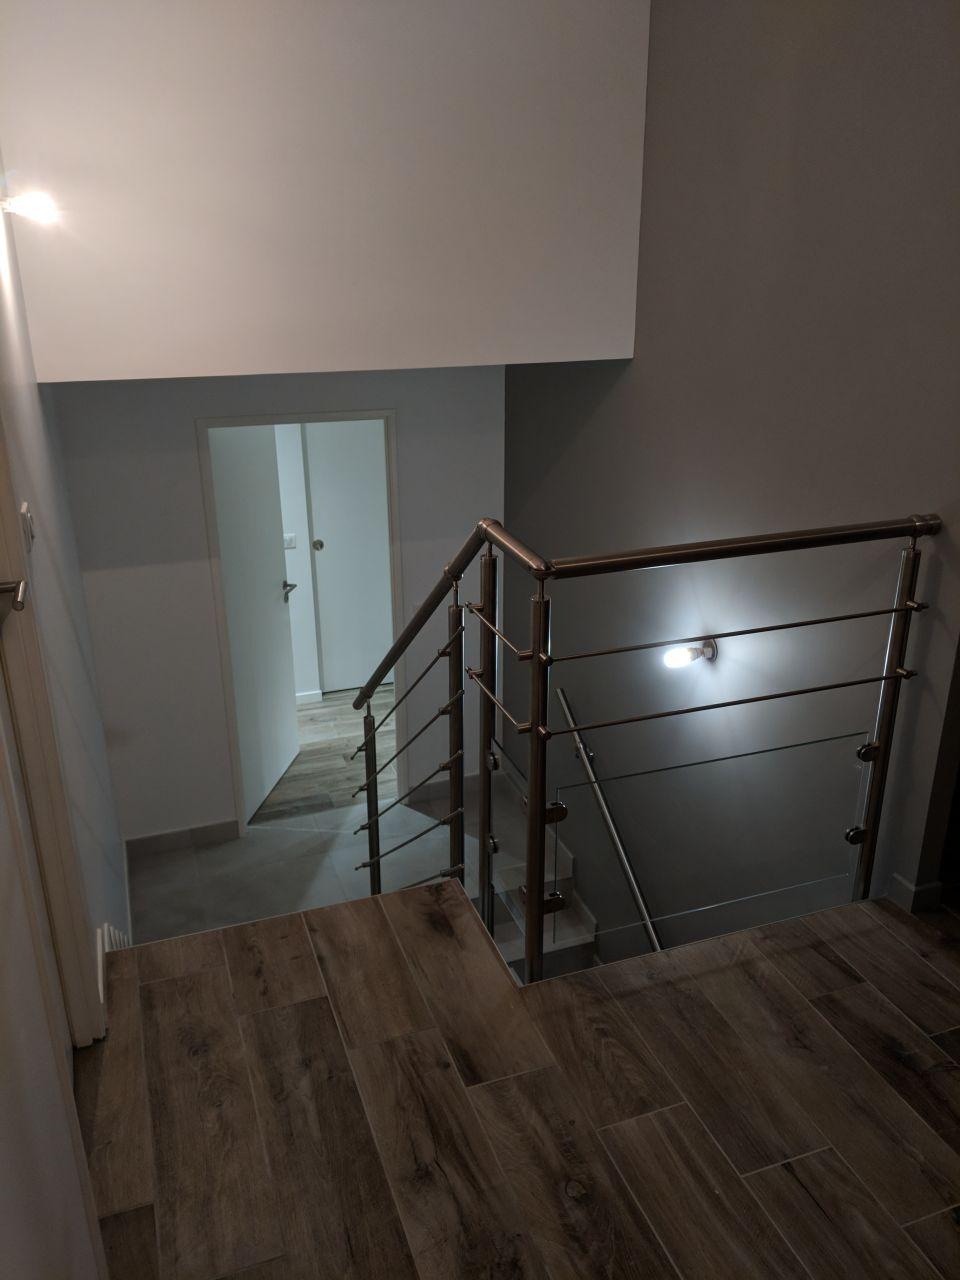 Escalier et rambarde